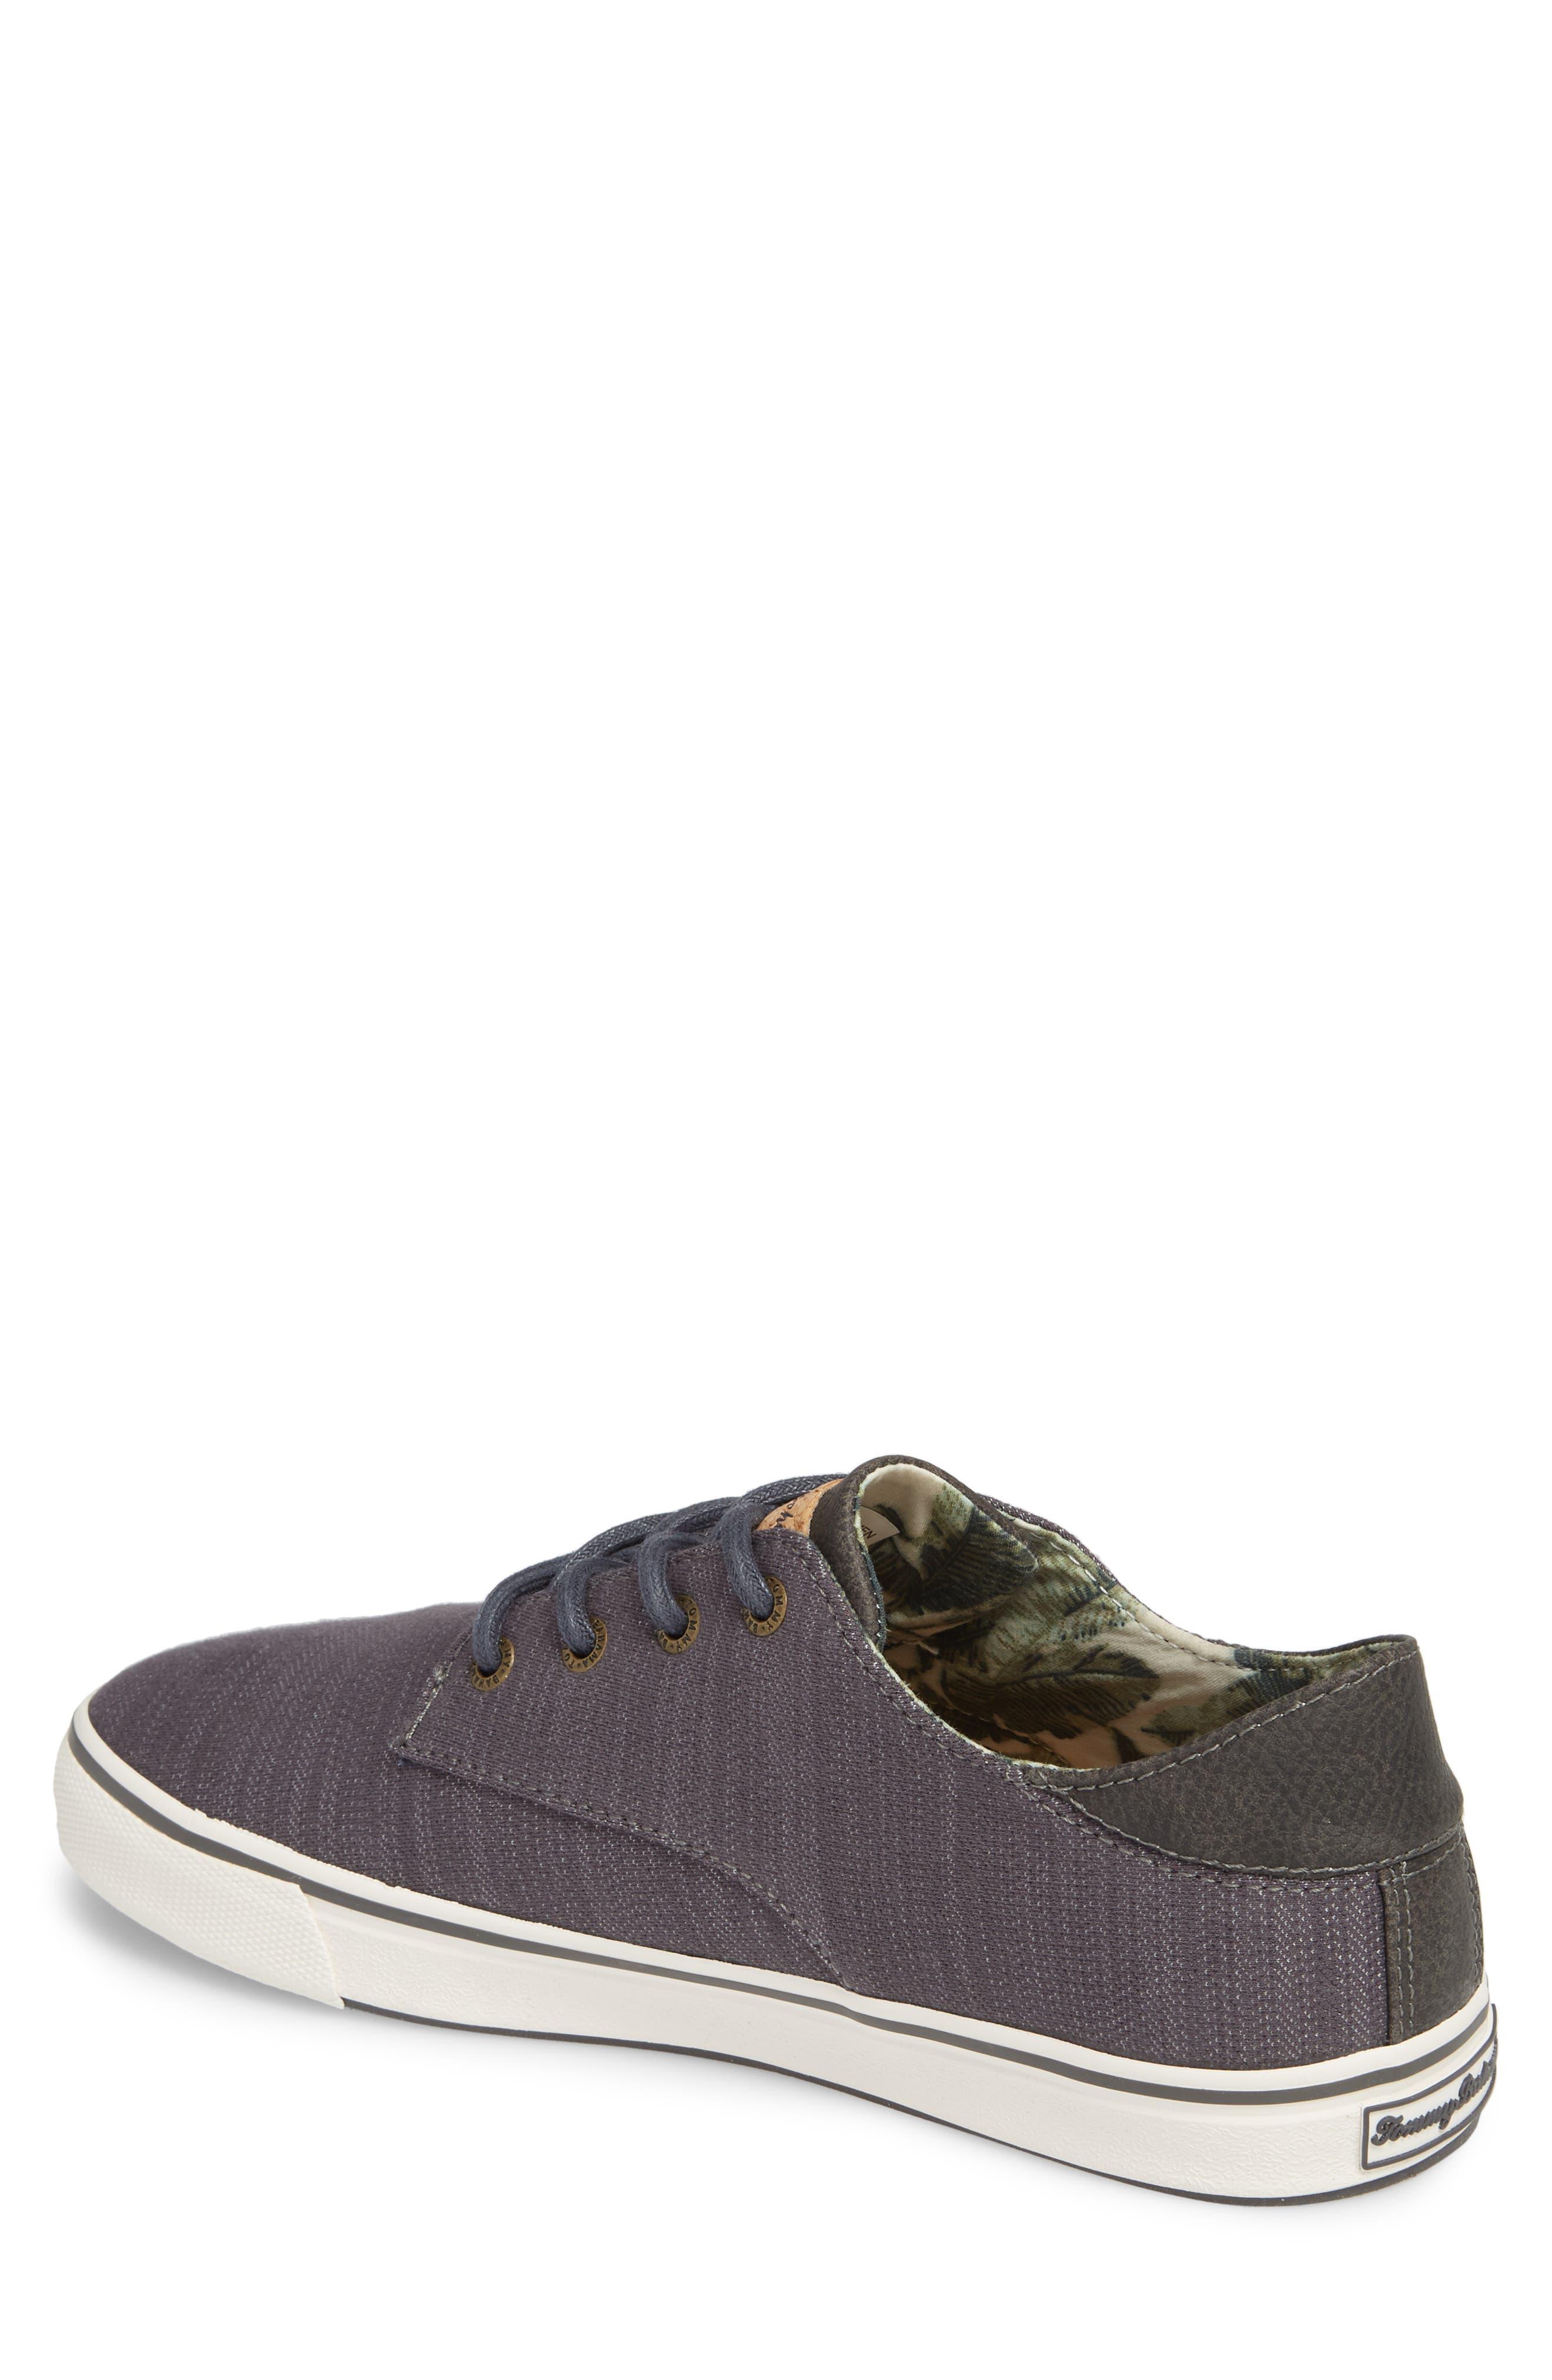 Dune Sneaker,                             Alternate thumbnail 2, color,                             Grey Denim